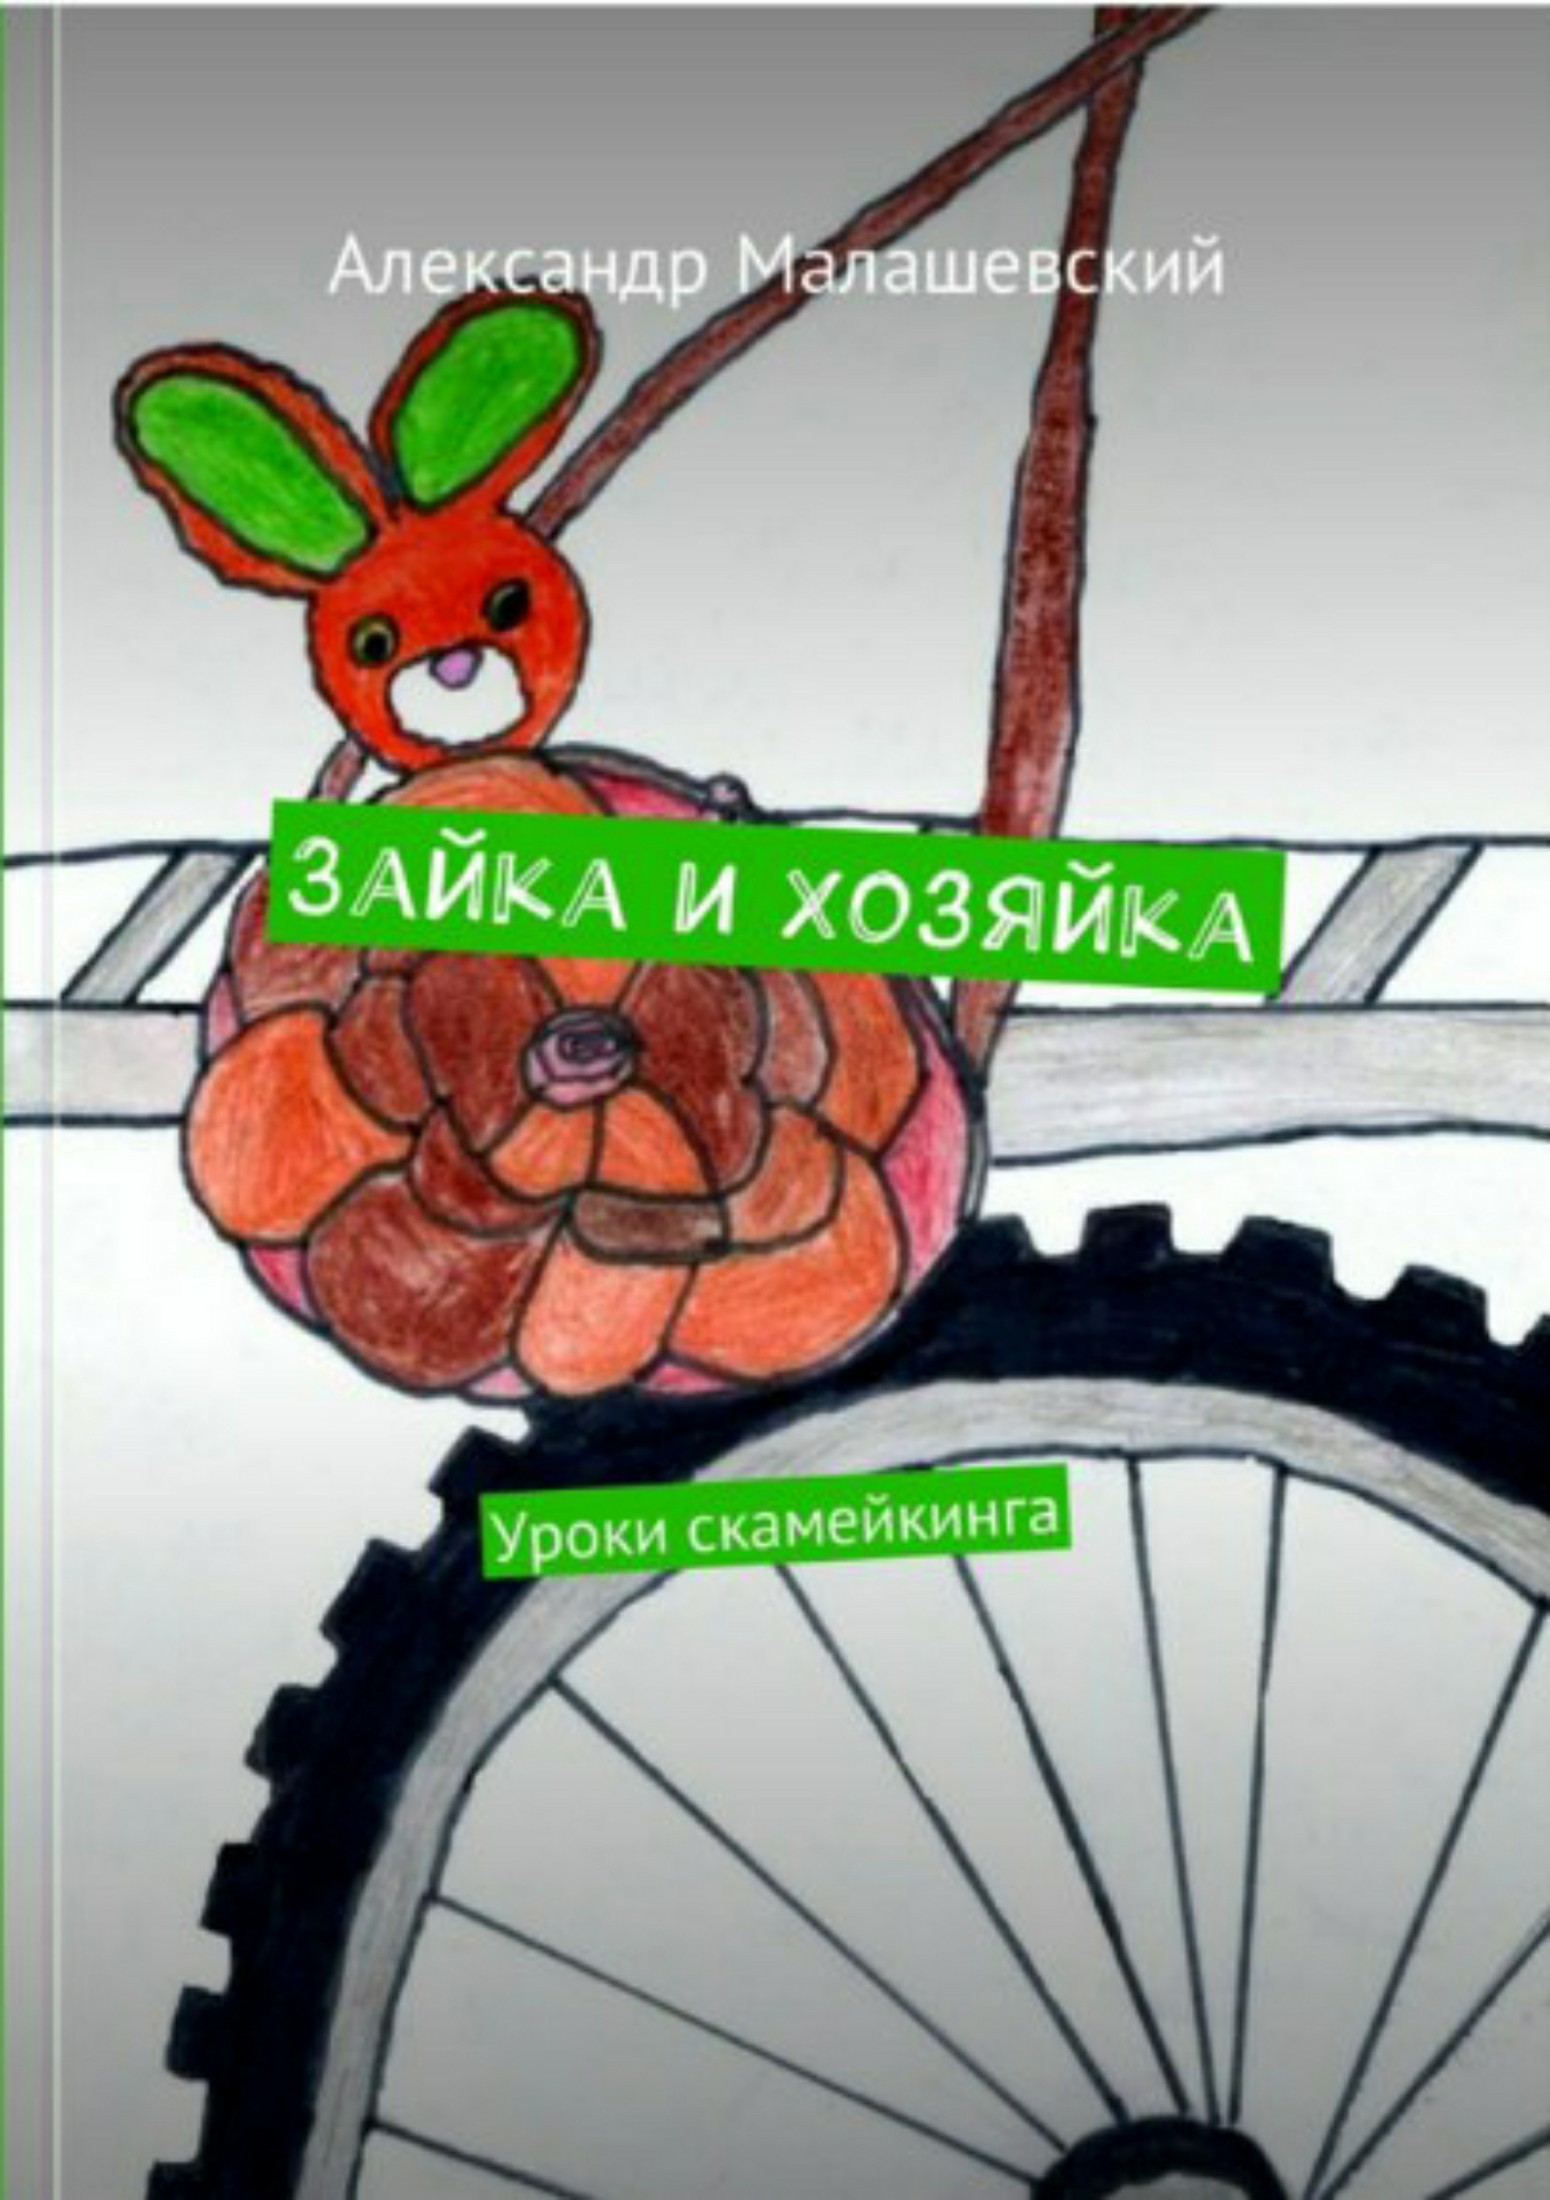 Александр Малашевский - Зайка и Хозяйка. Уроки скамейкинга